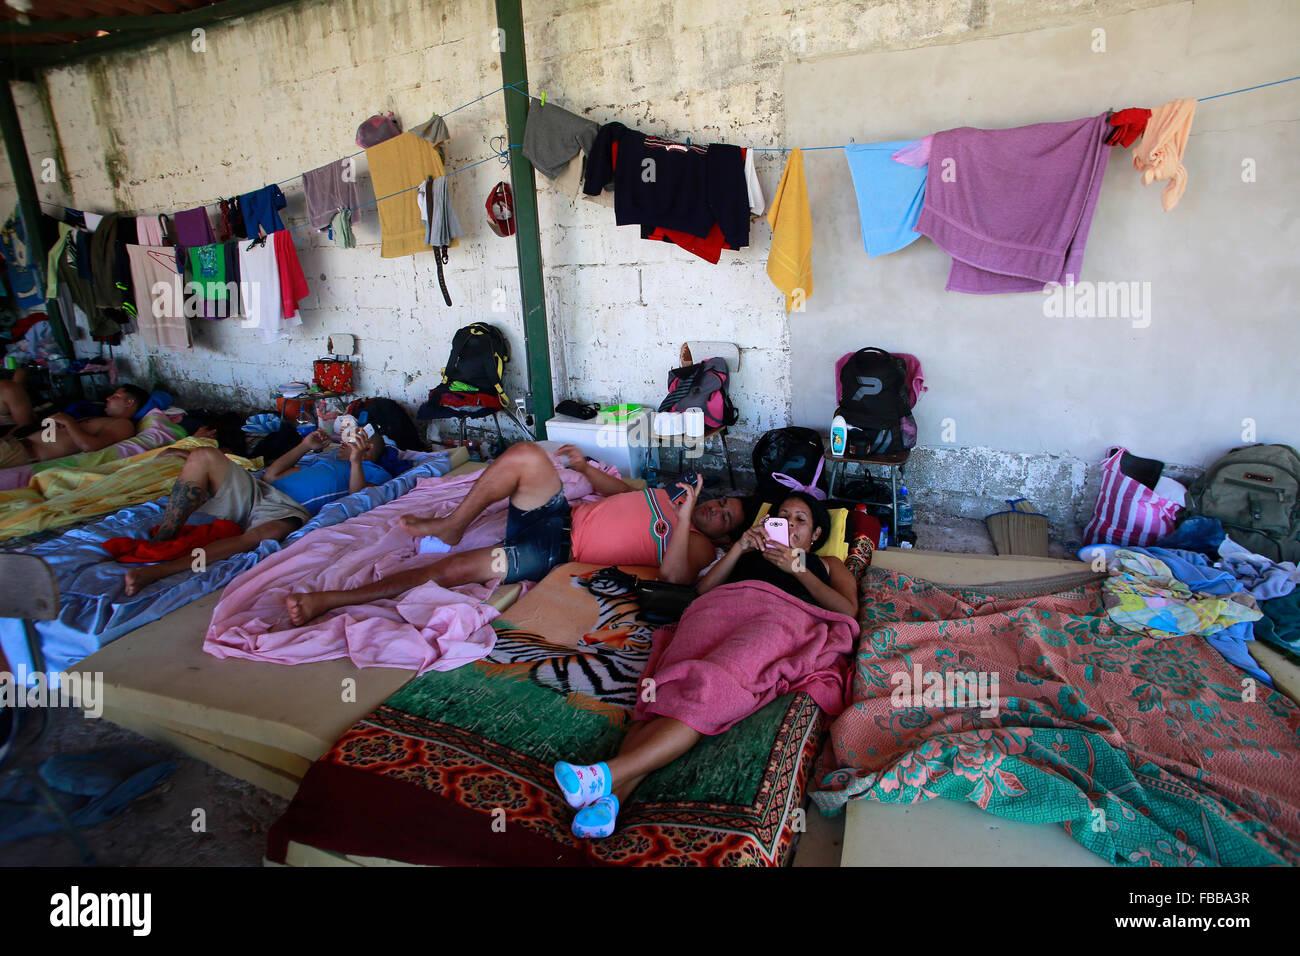 (160114) -- LA CRUZ, Jan. 14, 2016 (Xinhua) -- Cuban migrants rest at a shelter in La Cruz, Costa Rica, on Jan. Stock Photo